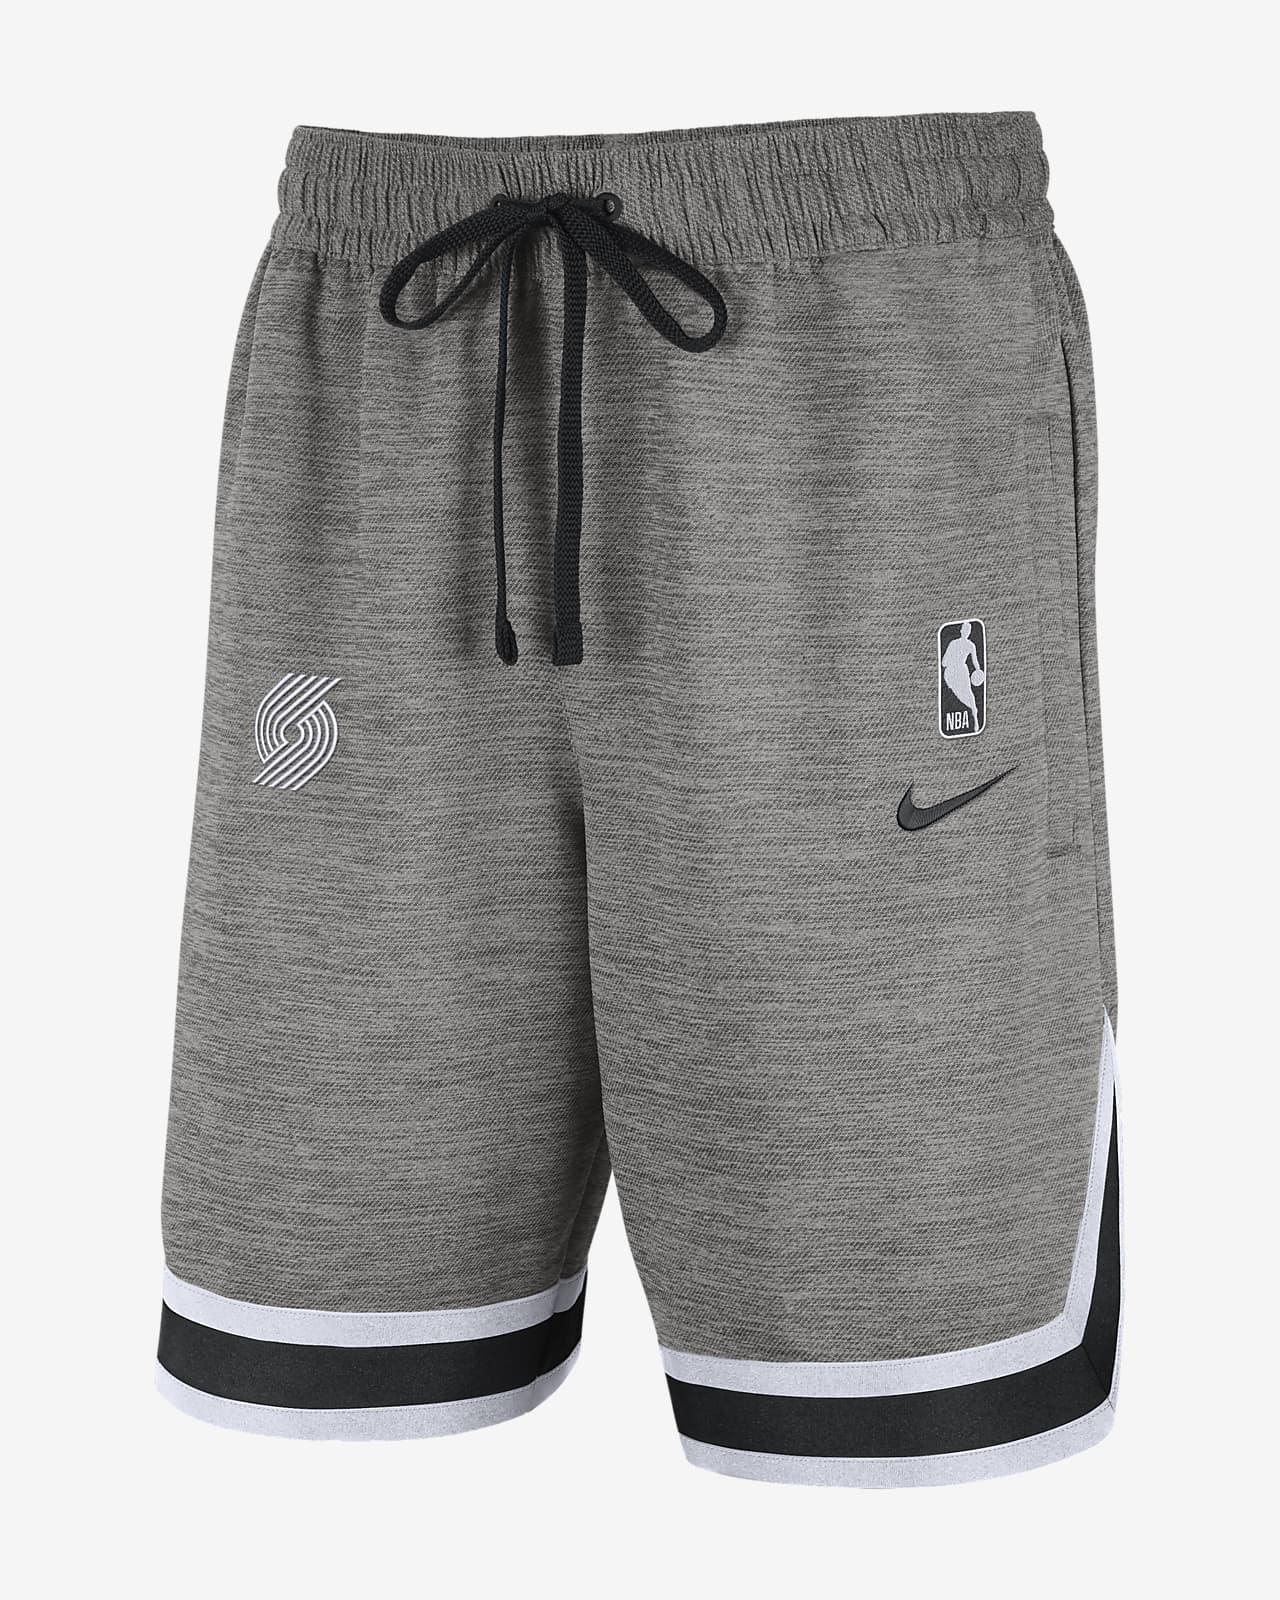 Trail Blazers Men's Nike Therma Flex NBA Shorts